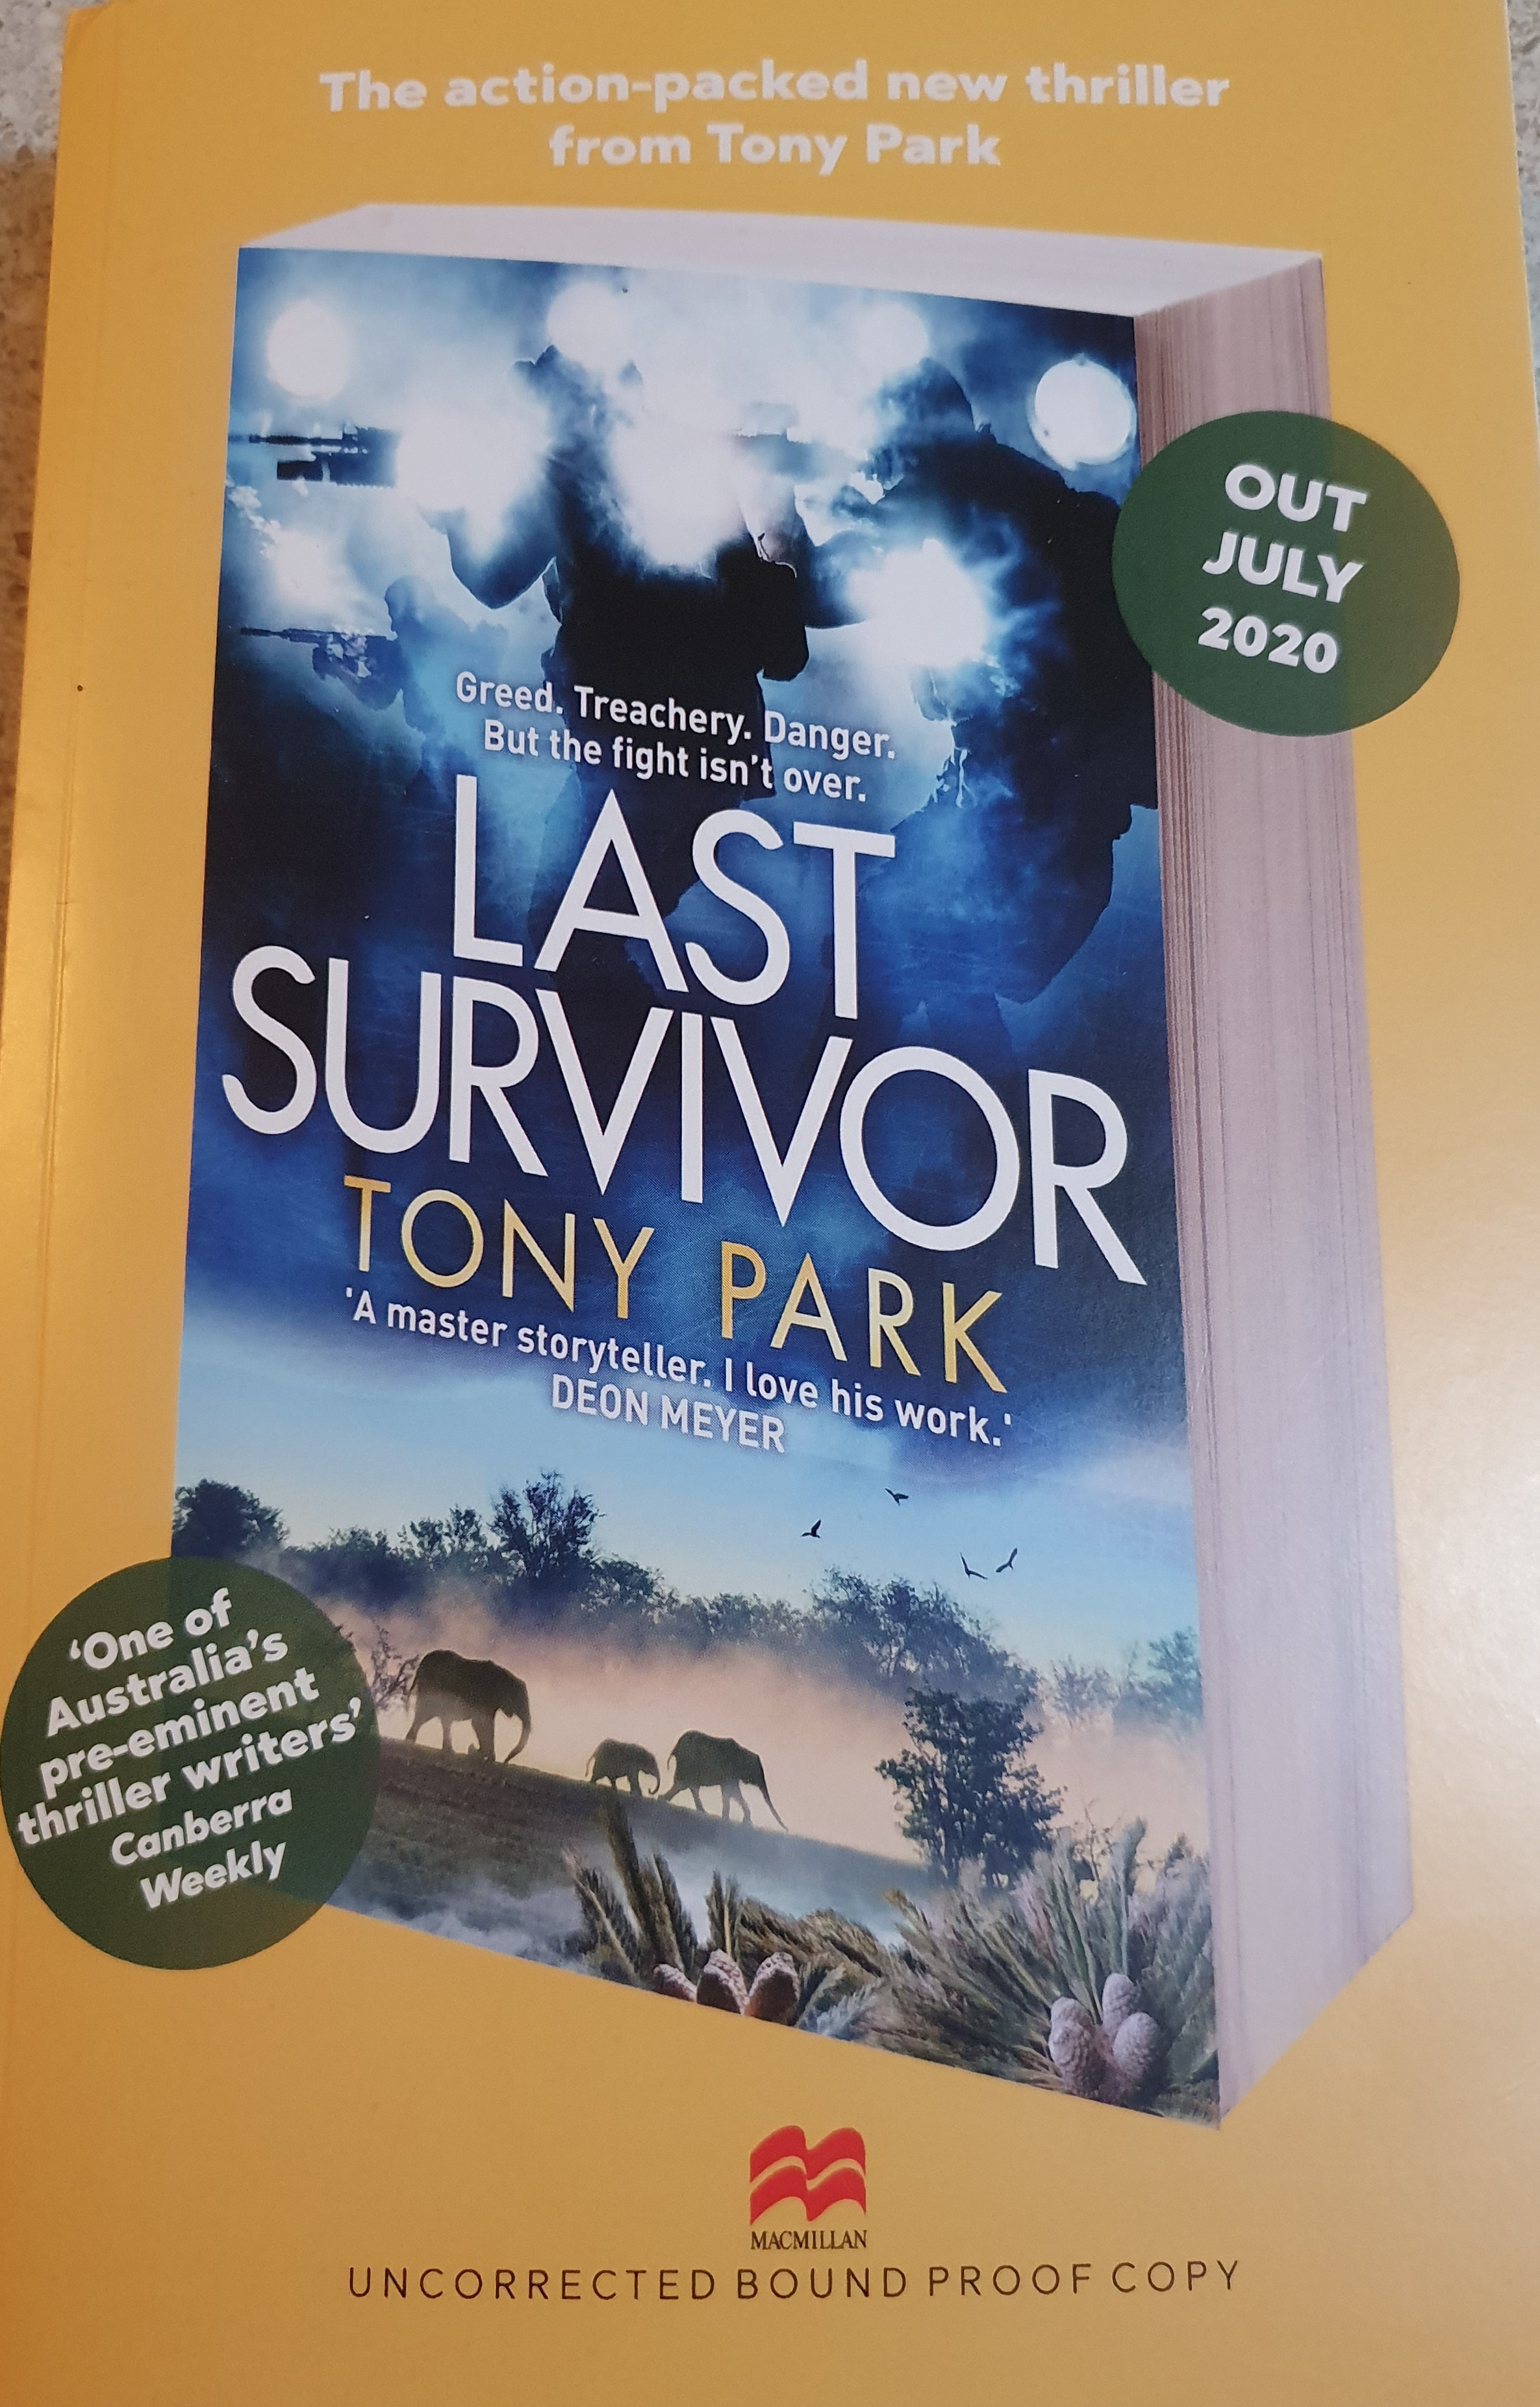 Last Survivor Cover - Uncorrected Proof